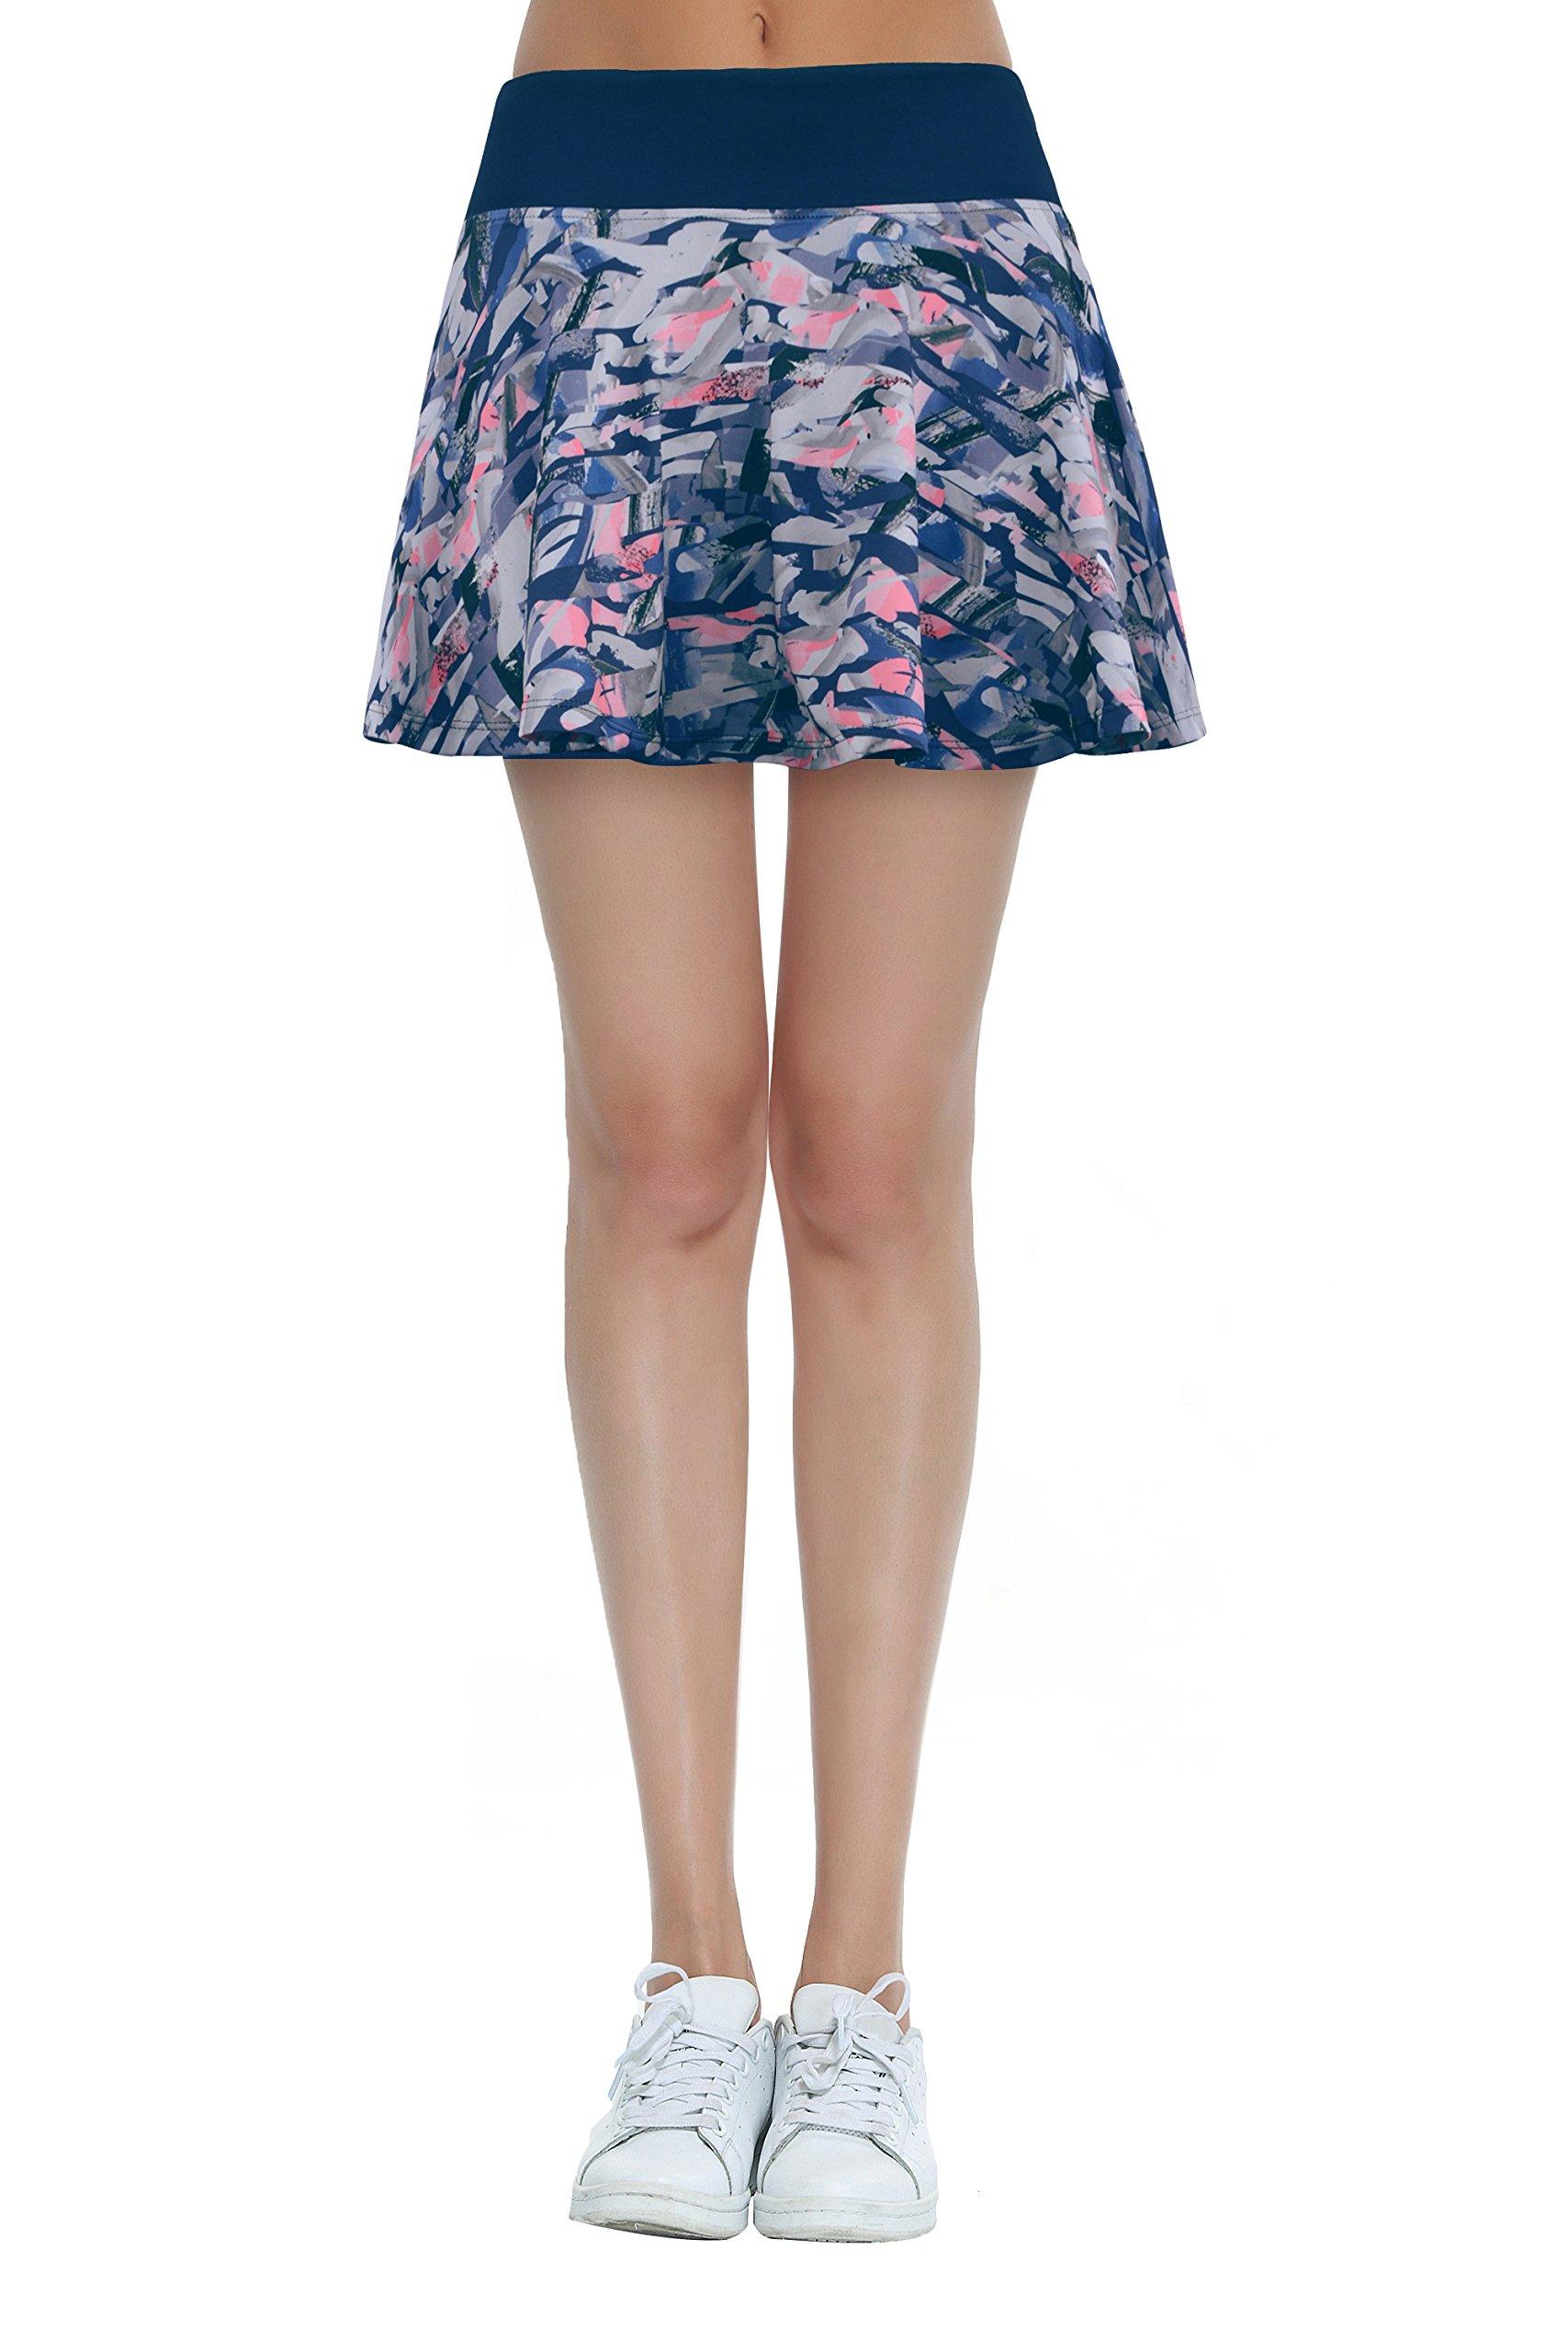 Cityoung Women Running Golf Skort Plus Size Pocket Girl Athletic Tennis Skirt Shorts Underneath s Navy